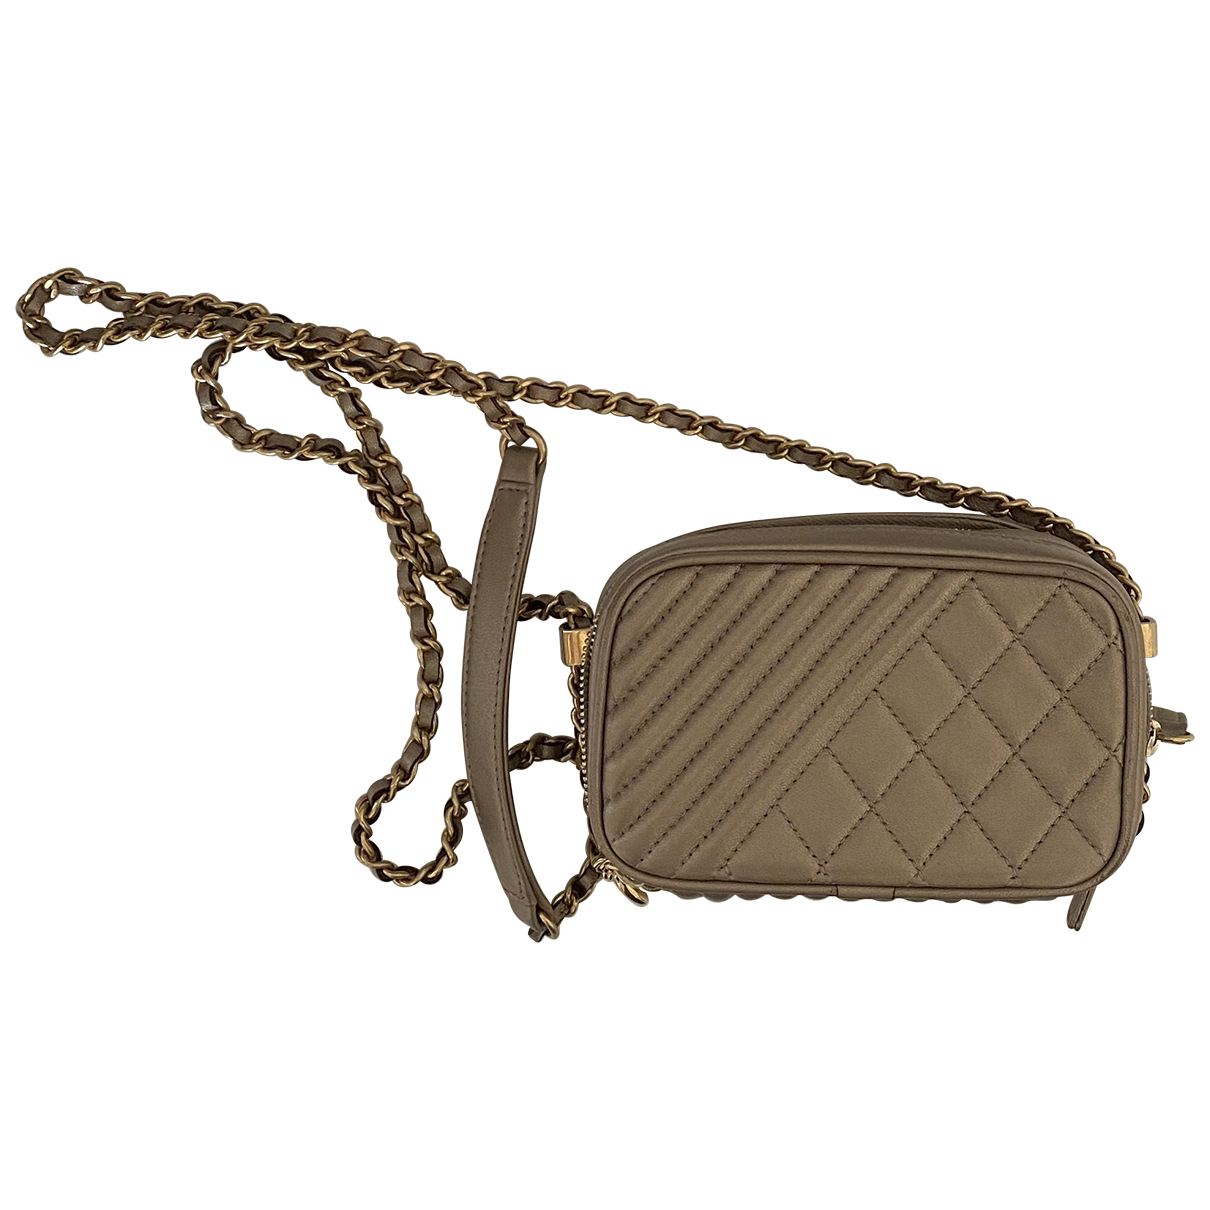 Chanel Camera Beige Leather handbag for Women \N